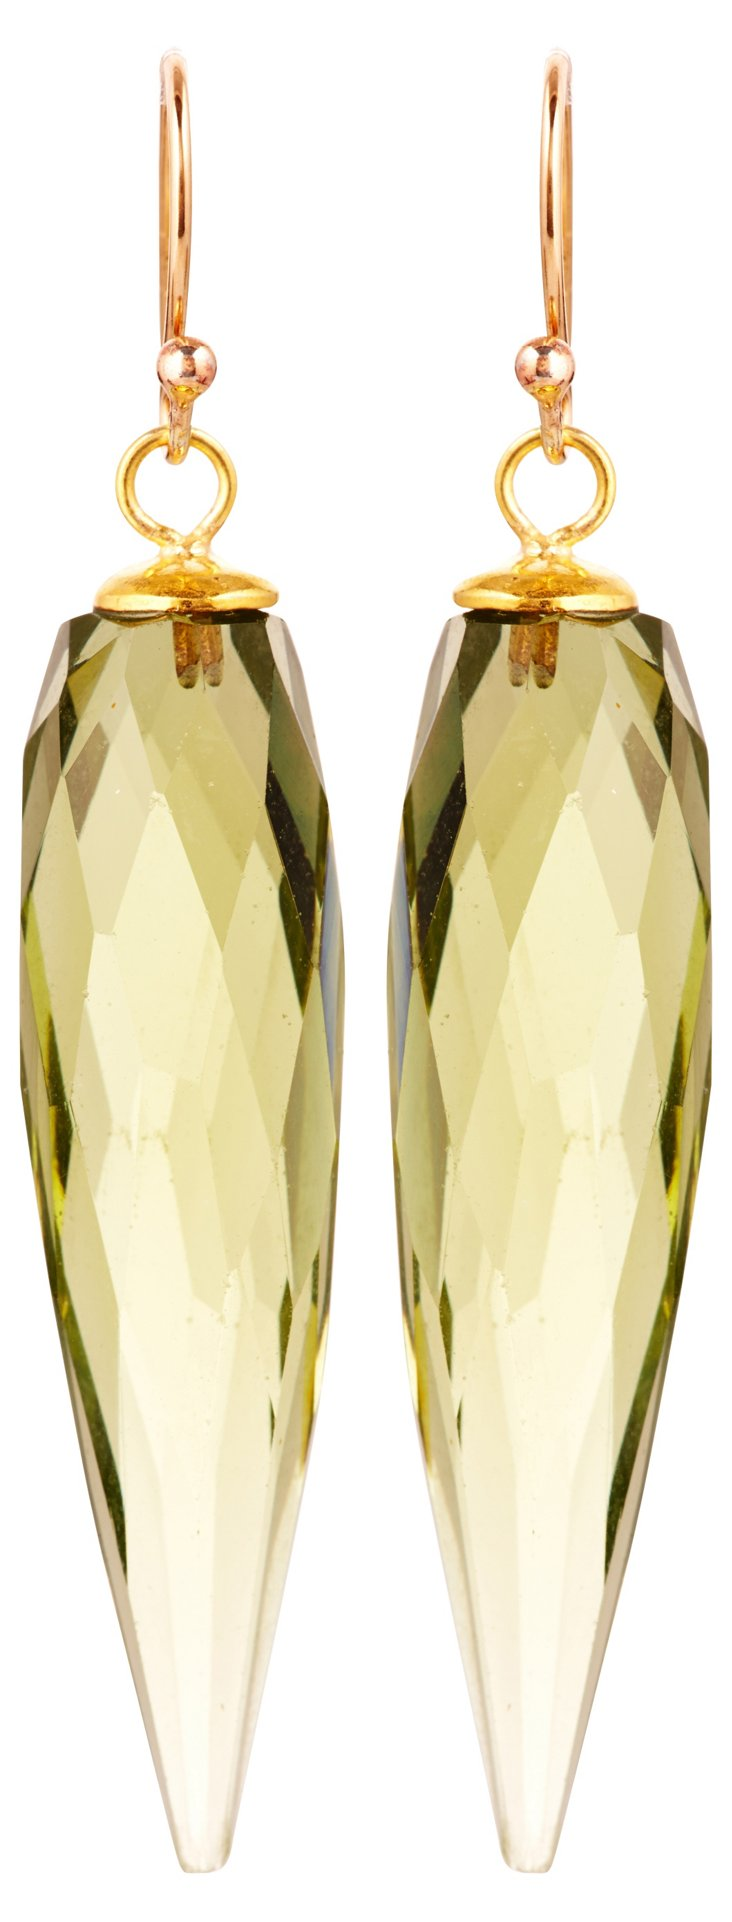 Olive Quartz Prism Earrings